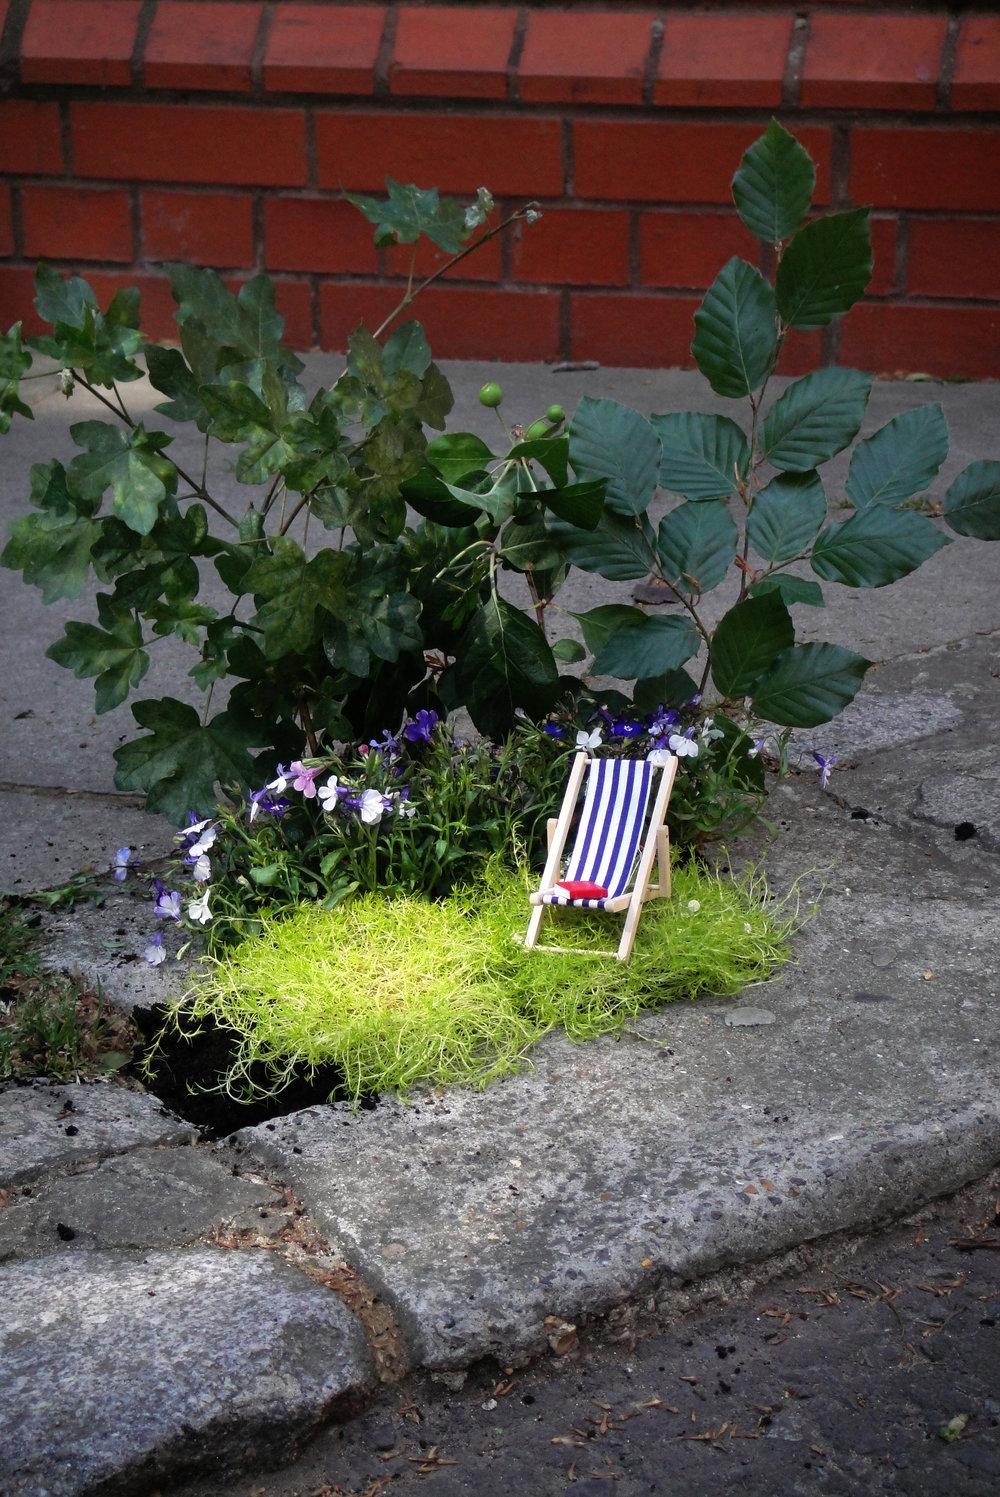 Pothole garden East London Guerilla Gardening Steve Wheen Chelsea